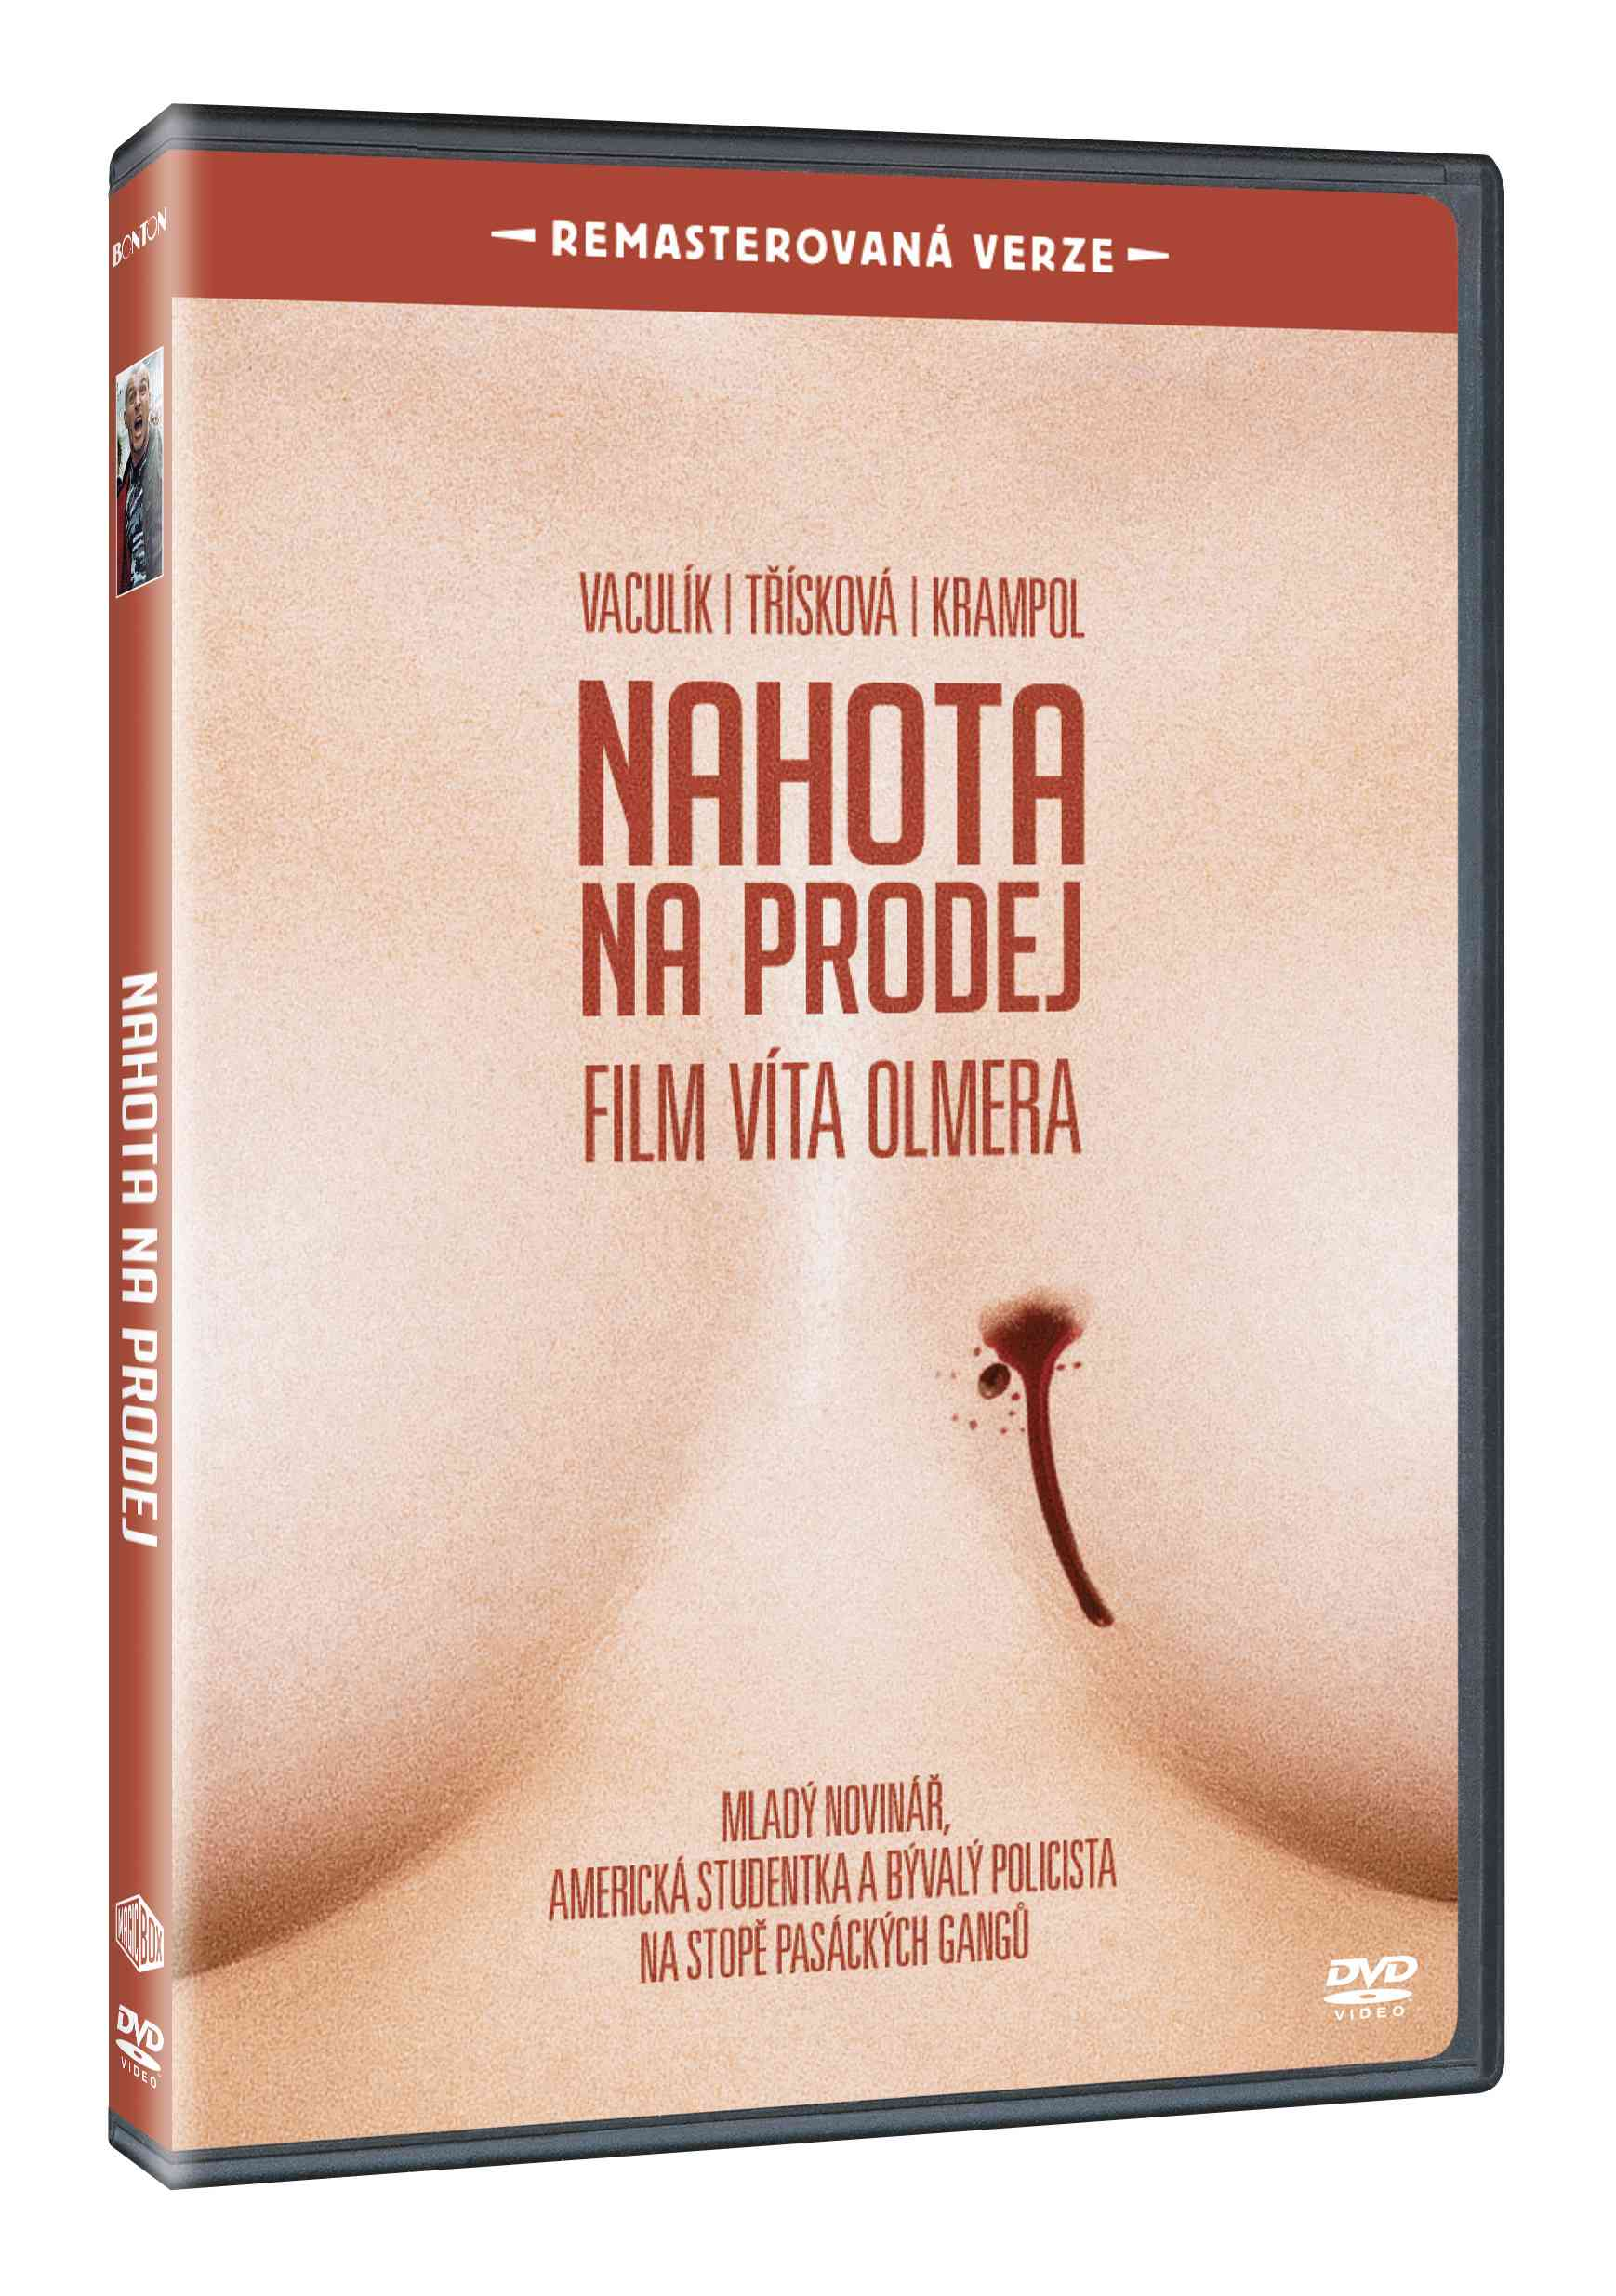 NAHOTA NA PRODEJ (Remasterovaná verze) - DVD